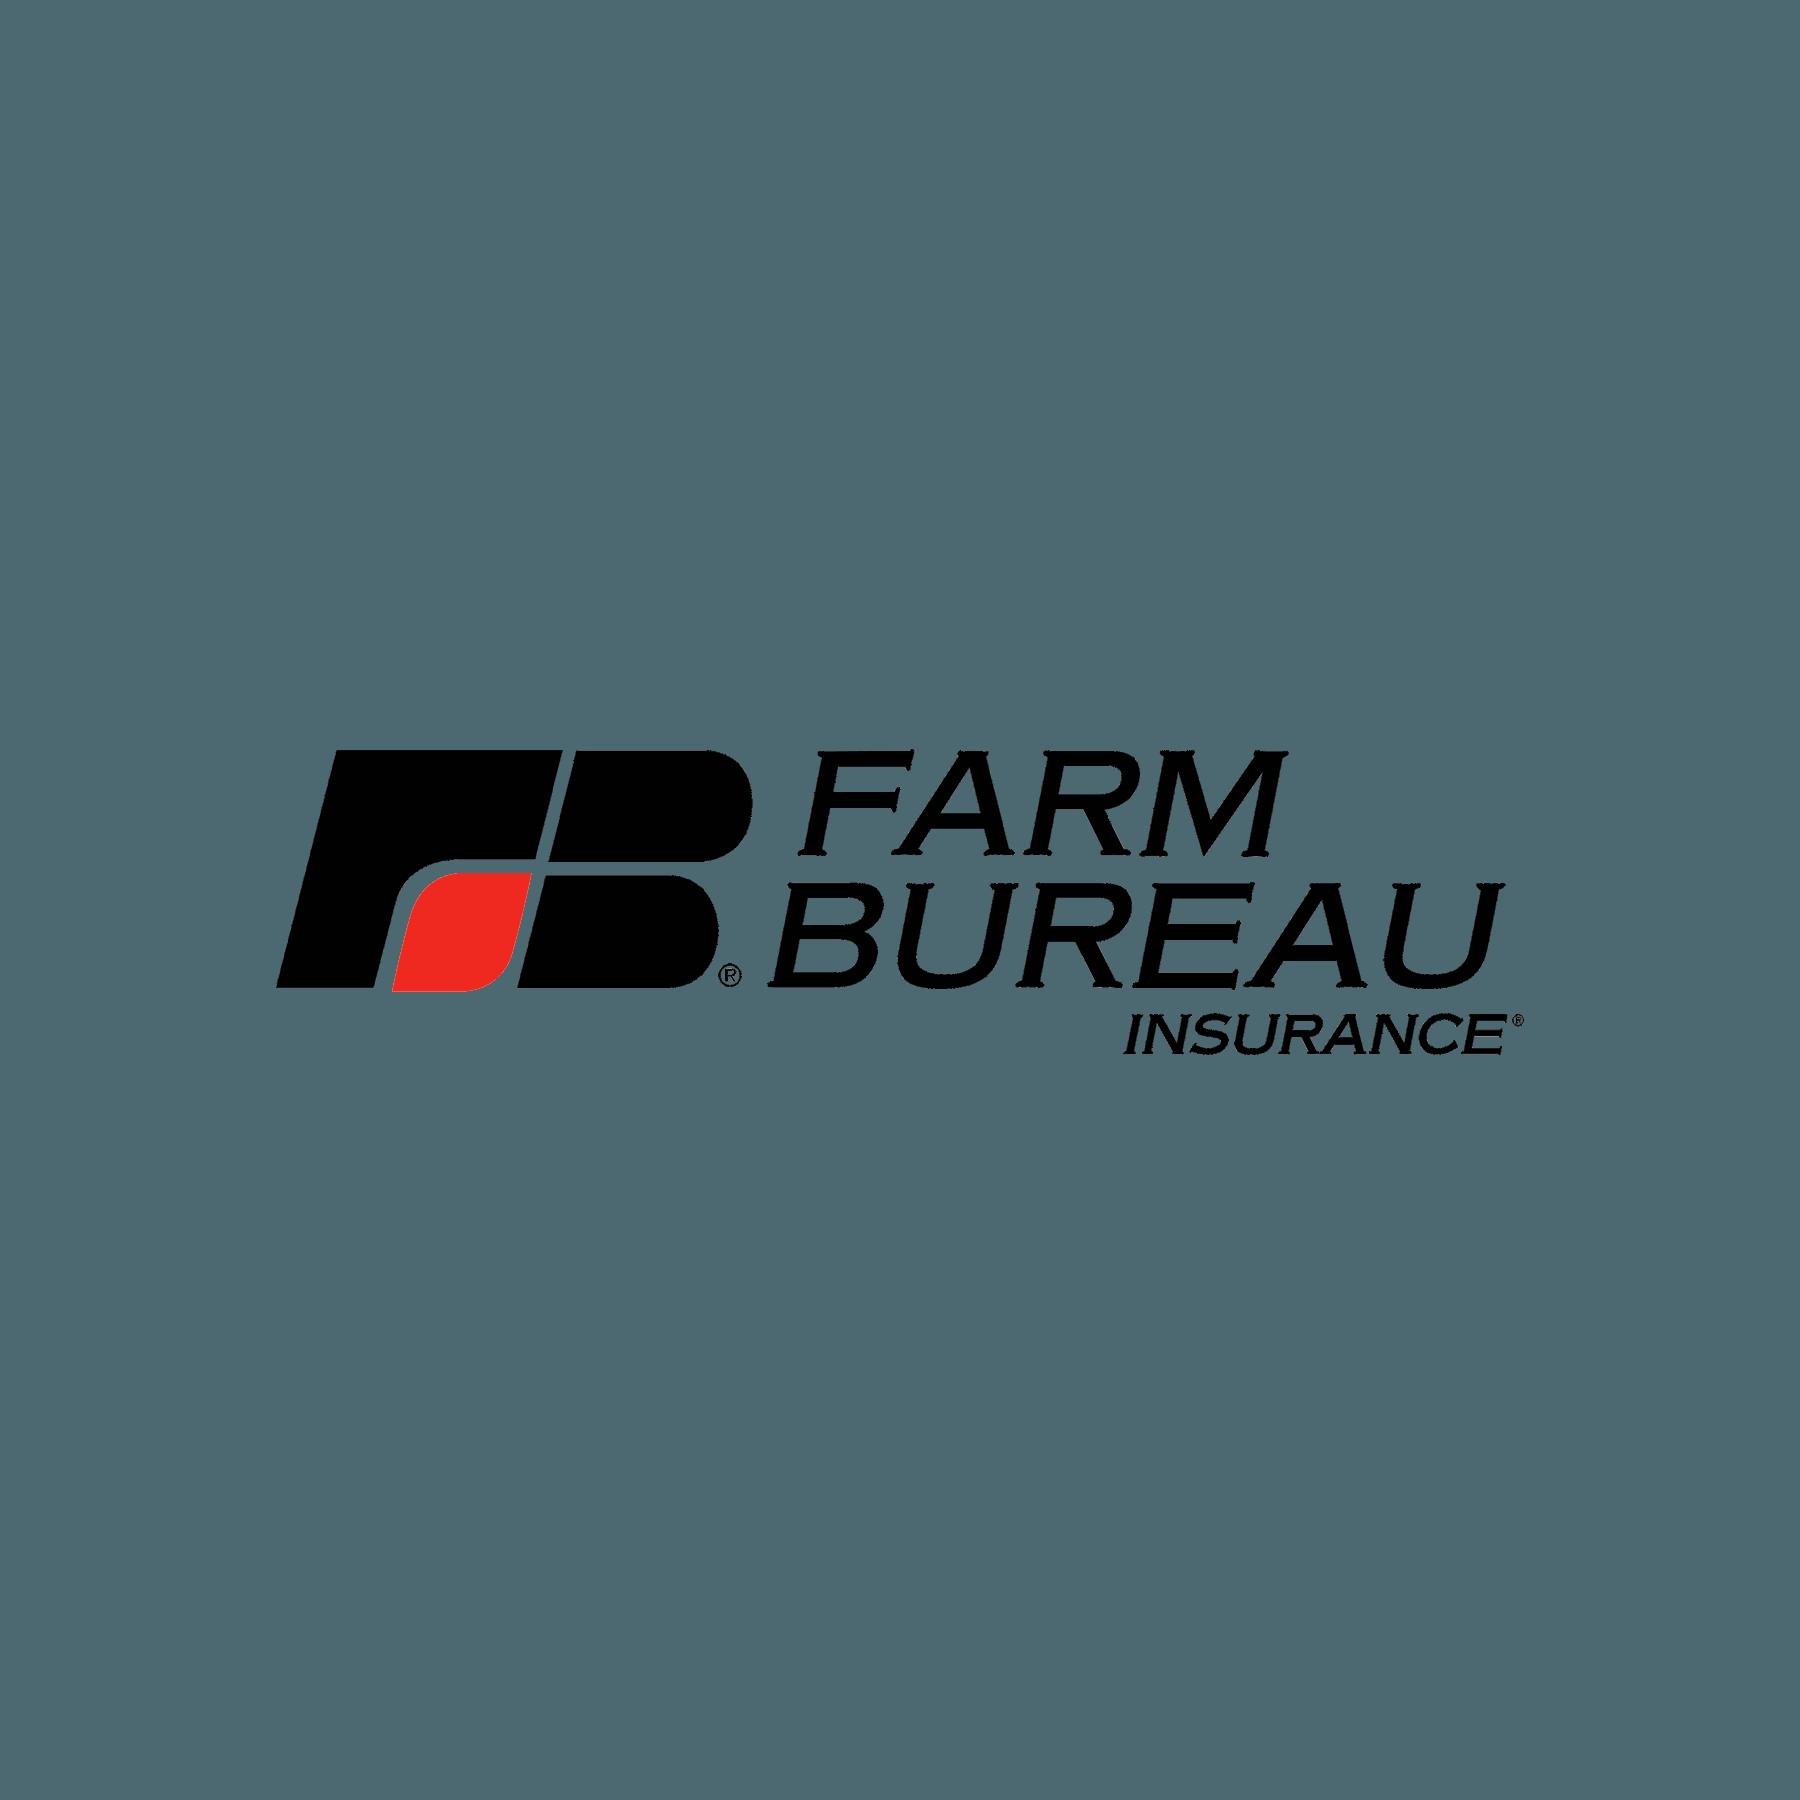 Tiberi Insurance Agency of Ann Arbor - Farm Bureau Insurance